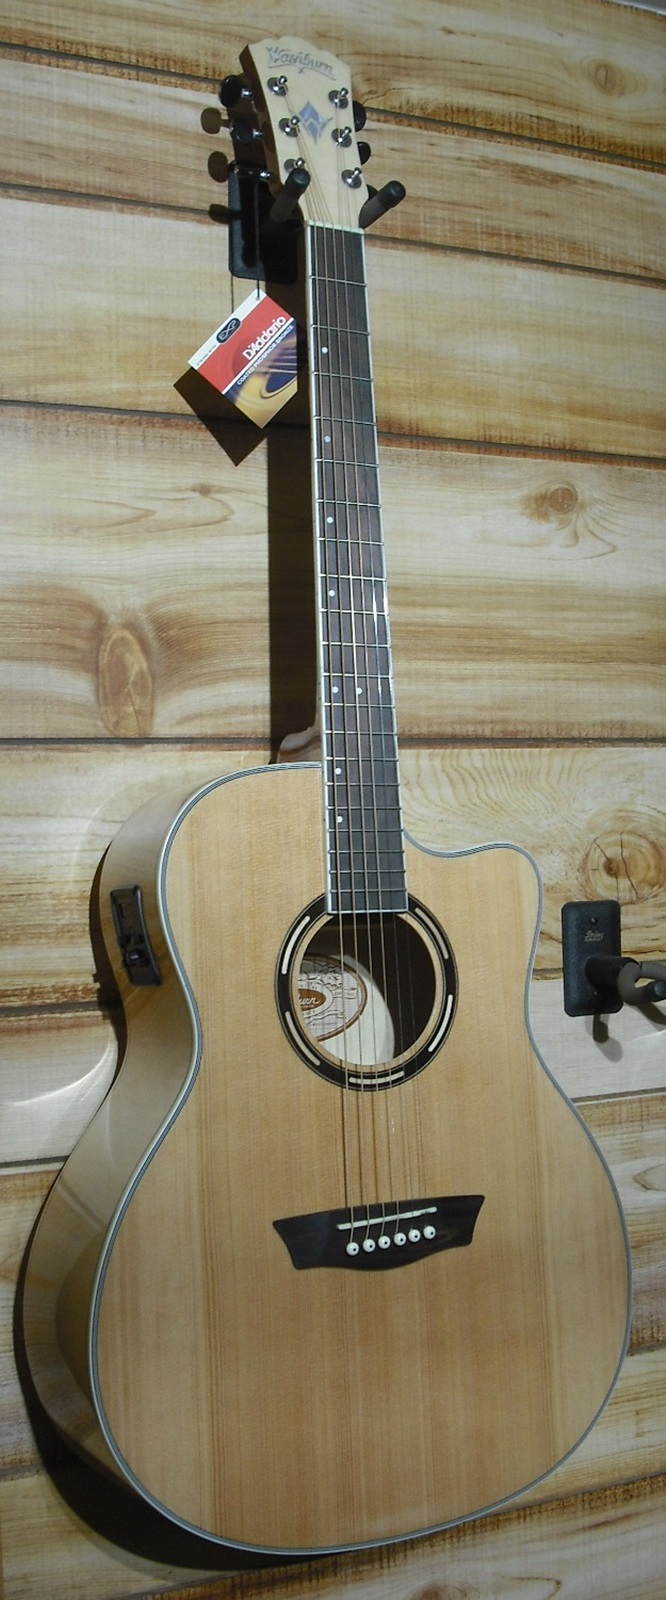 washburn ag40ce grand auditorium acoustic electric guitar natural w case. Black Bedroom Furniture Sets. Home Design Ideas